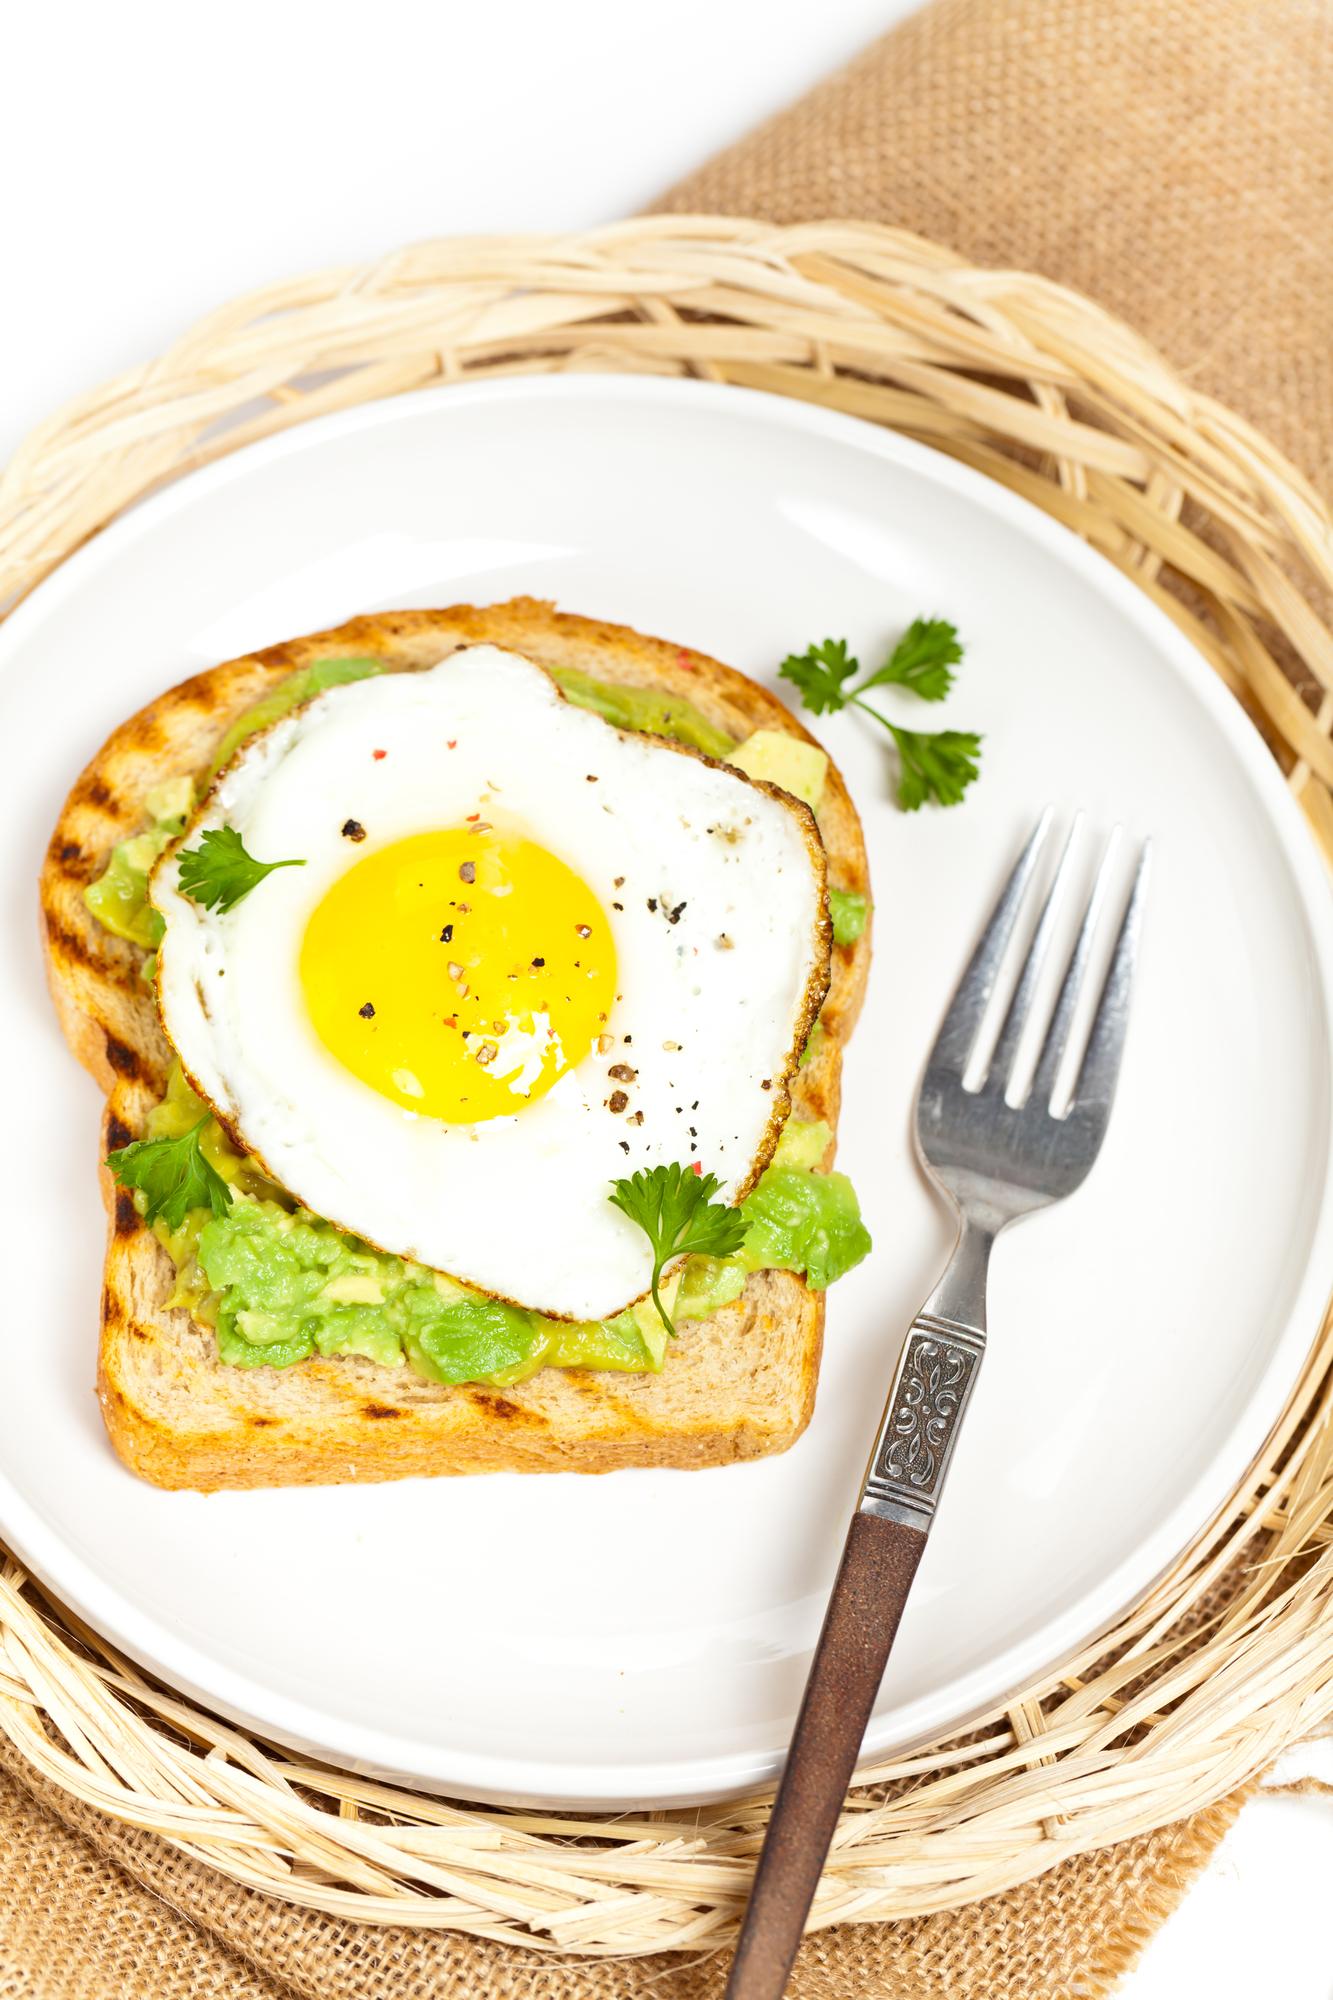 fried-egg-and-avocado-on-toast